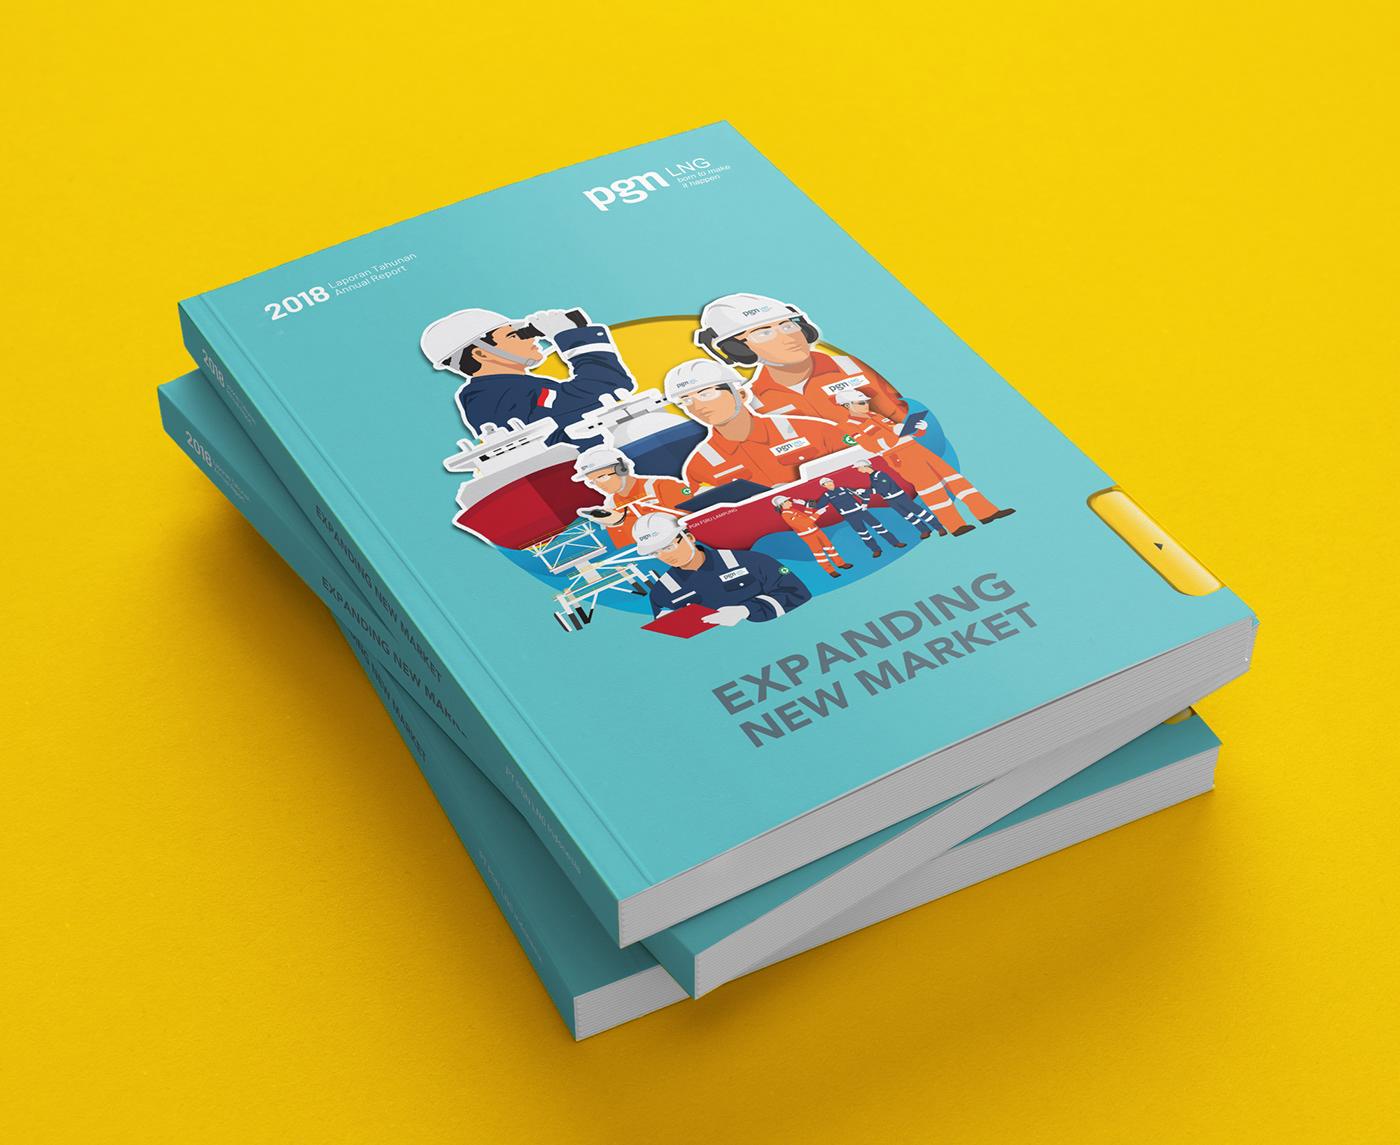 laporan tahunan annual report corporate communications